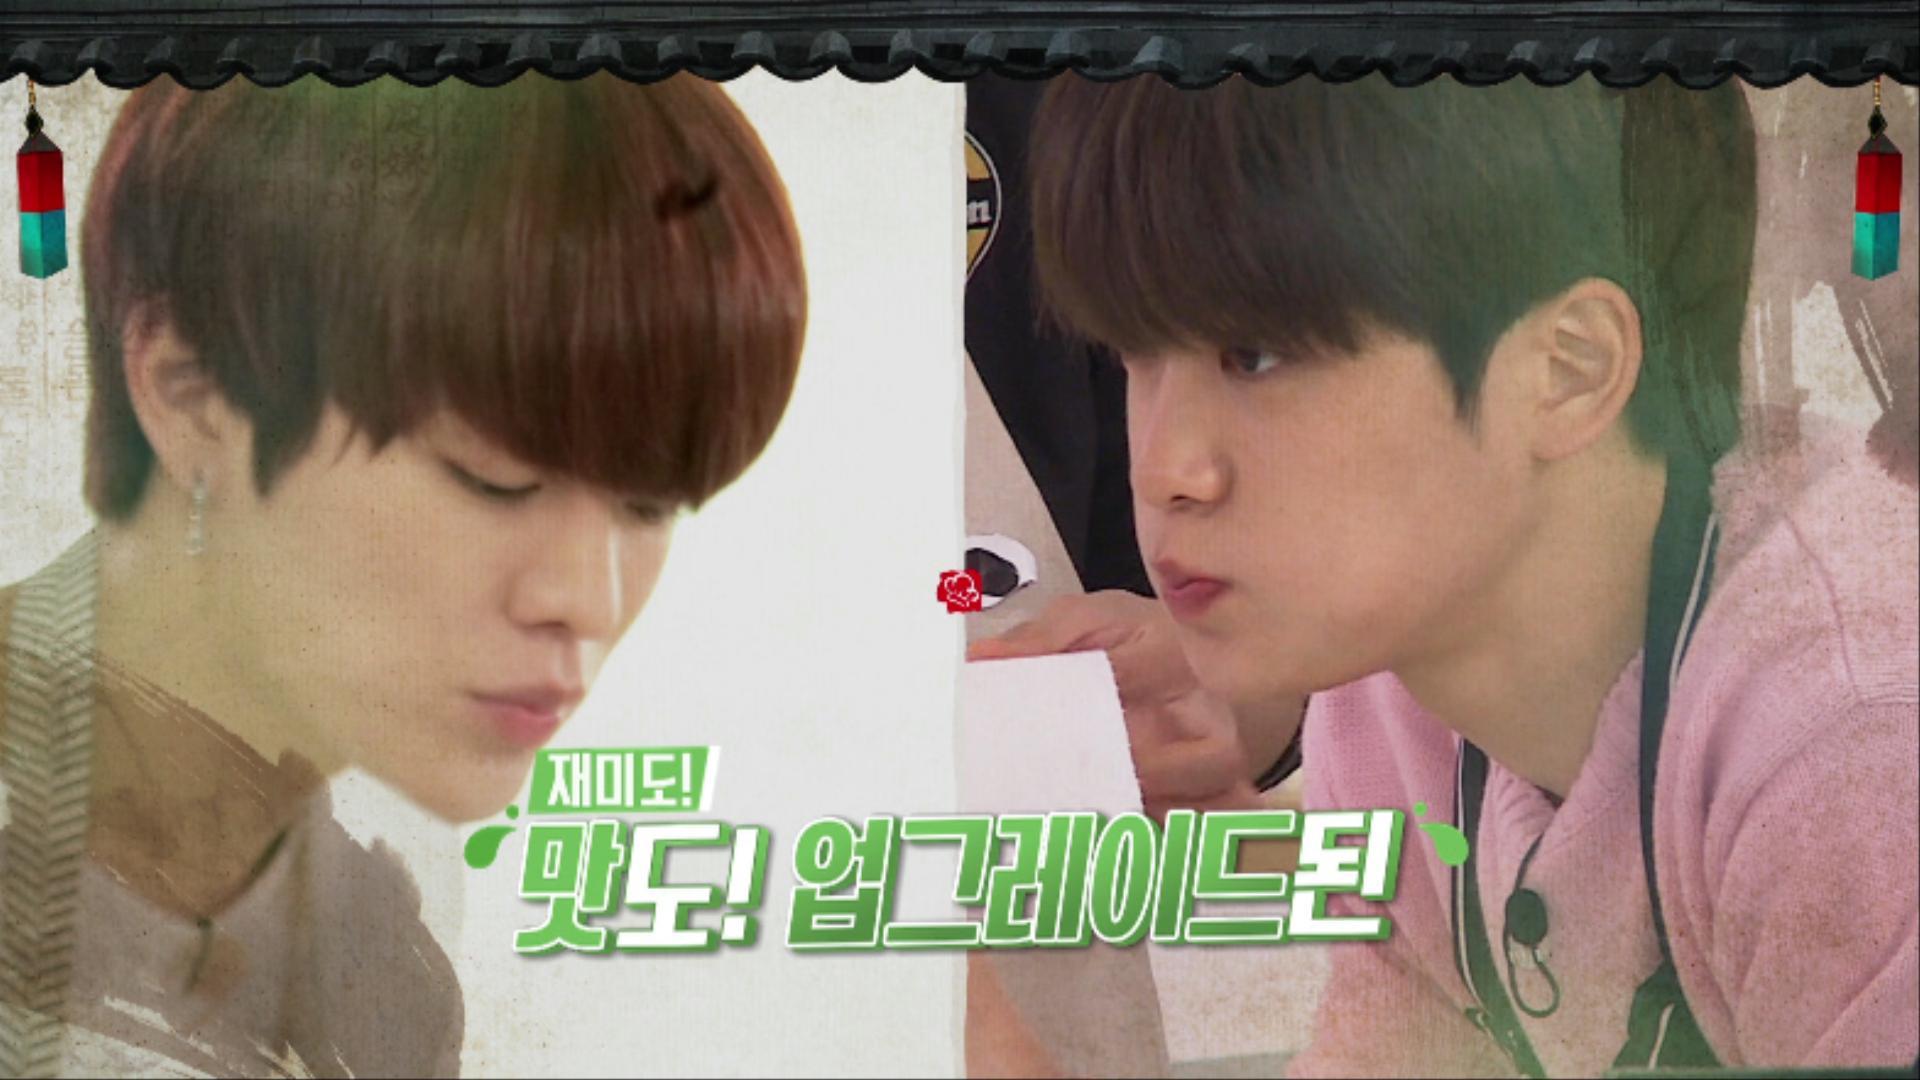 NCT LIFE 한식왕 도전기 EP 04 예고편